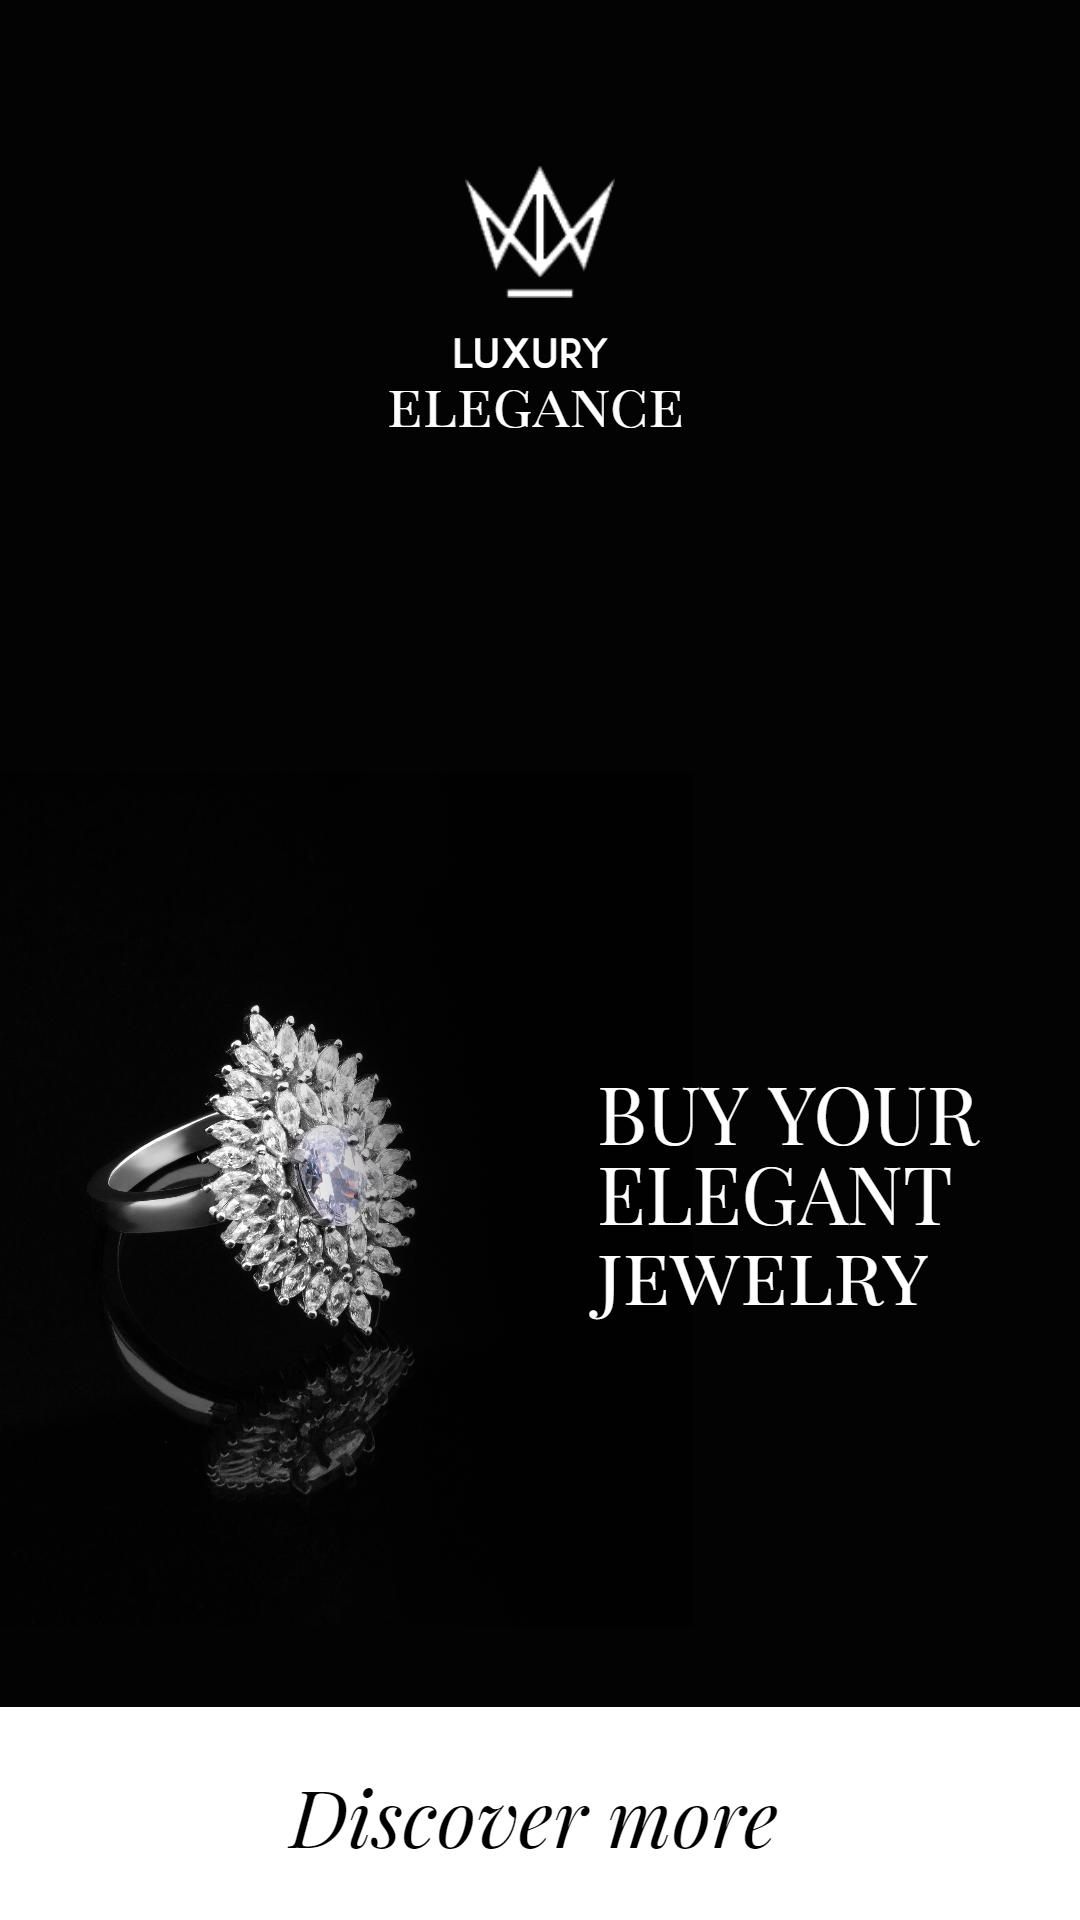 Diamond Ring Jewelry Sale Banner Design  Template